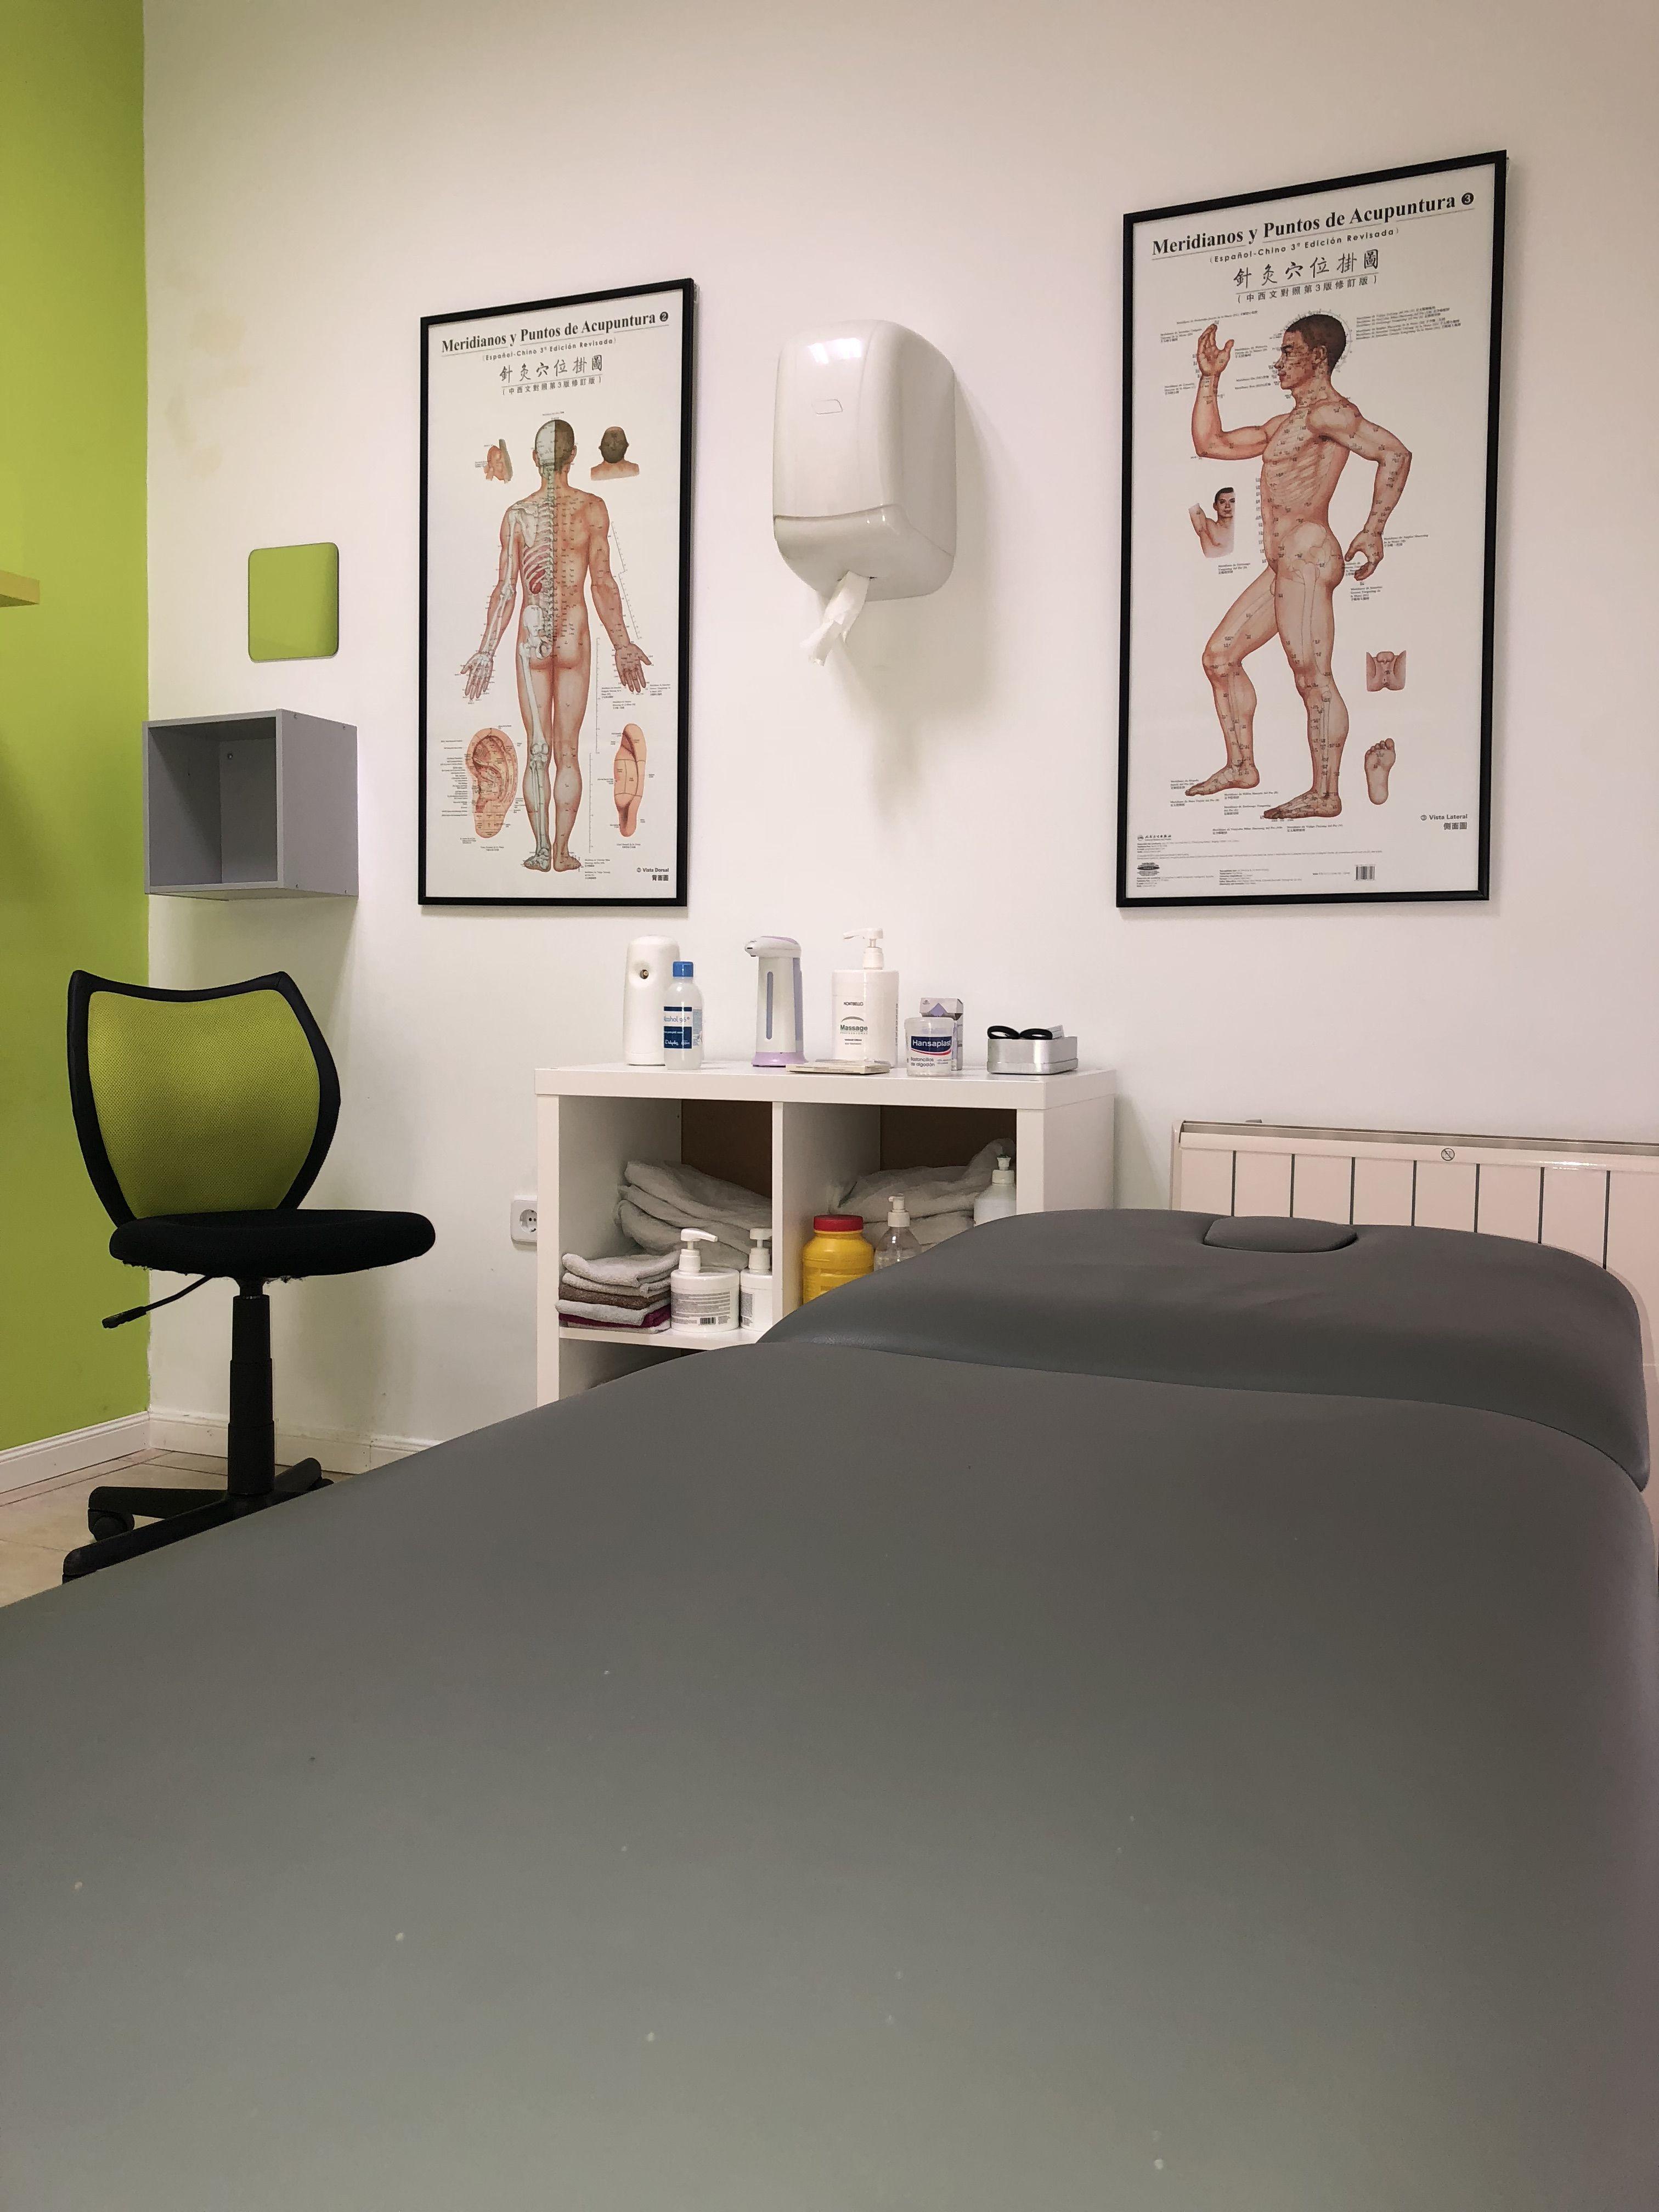 Foto 3 de Fisioterapia en Madrid | Cemaf